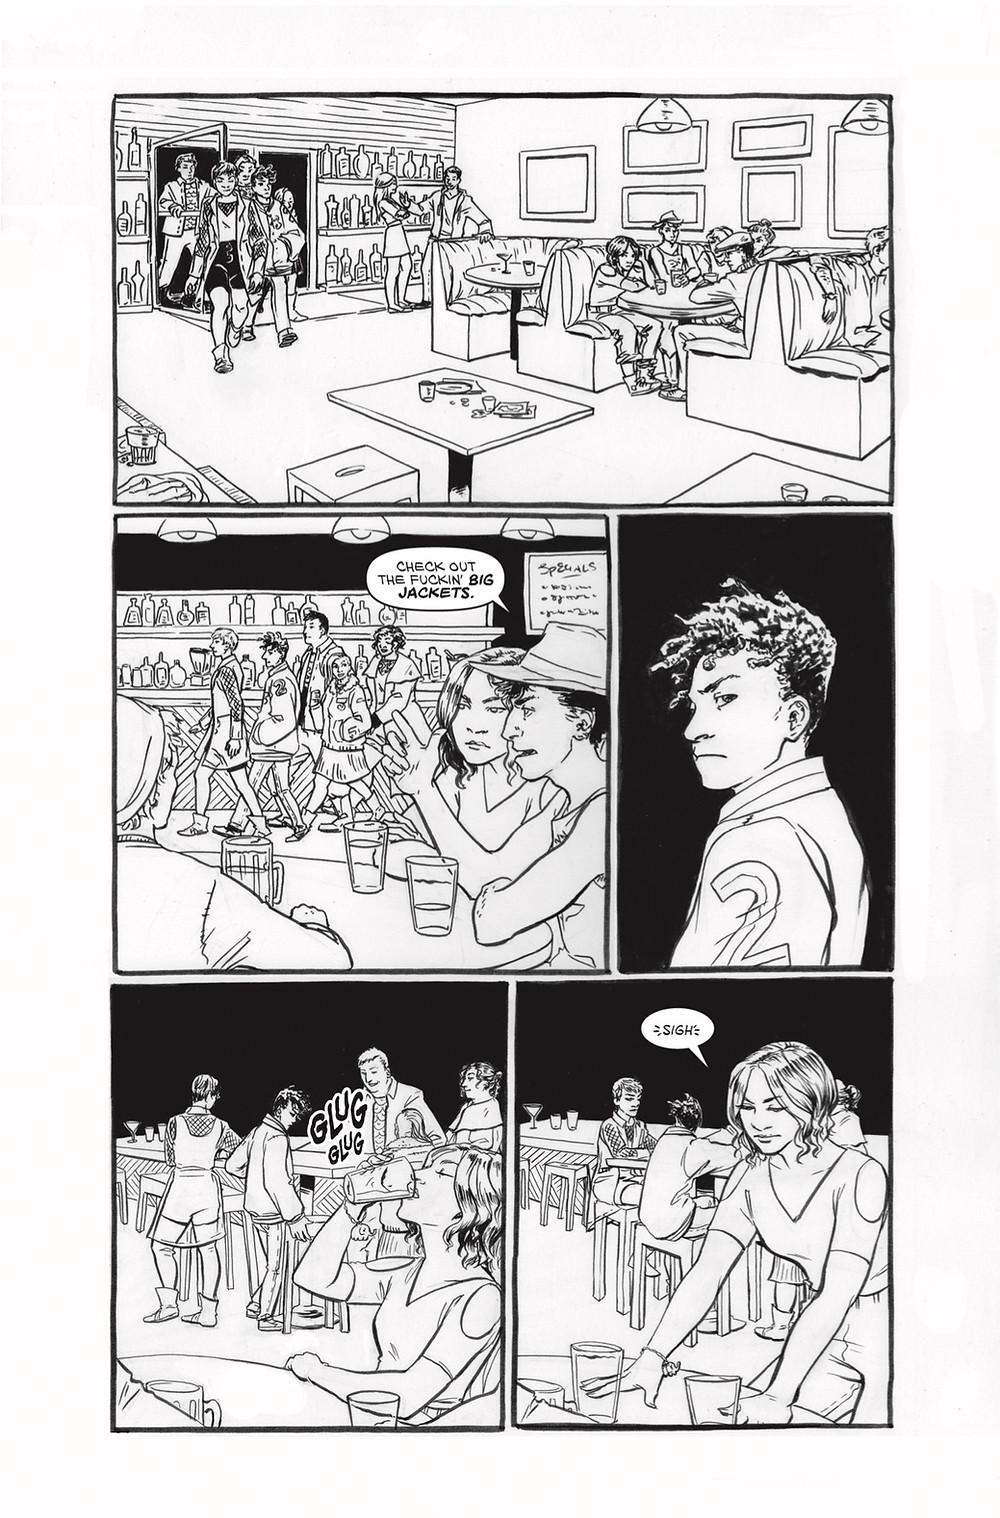 20 Fists #1, page 4, self-published, White/Baumann